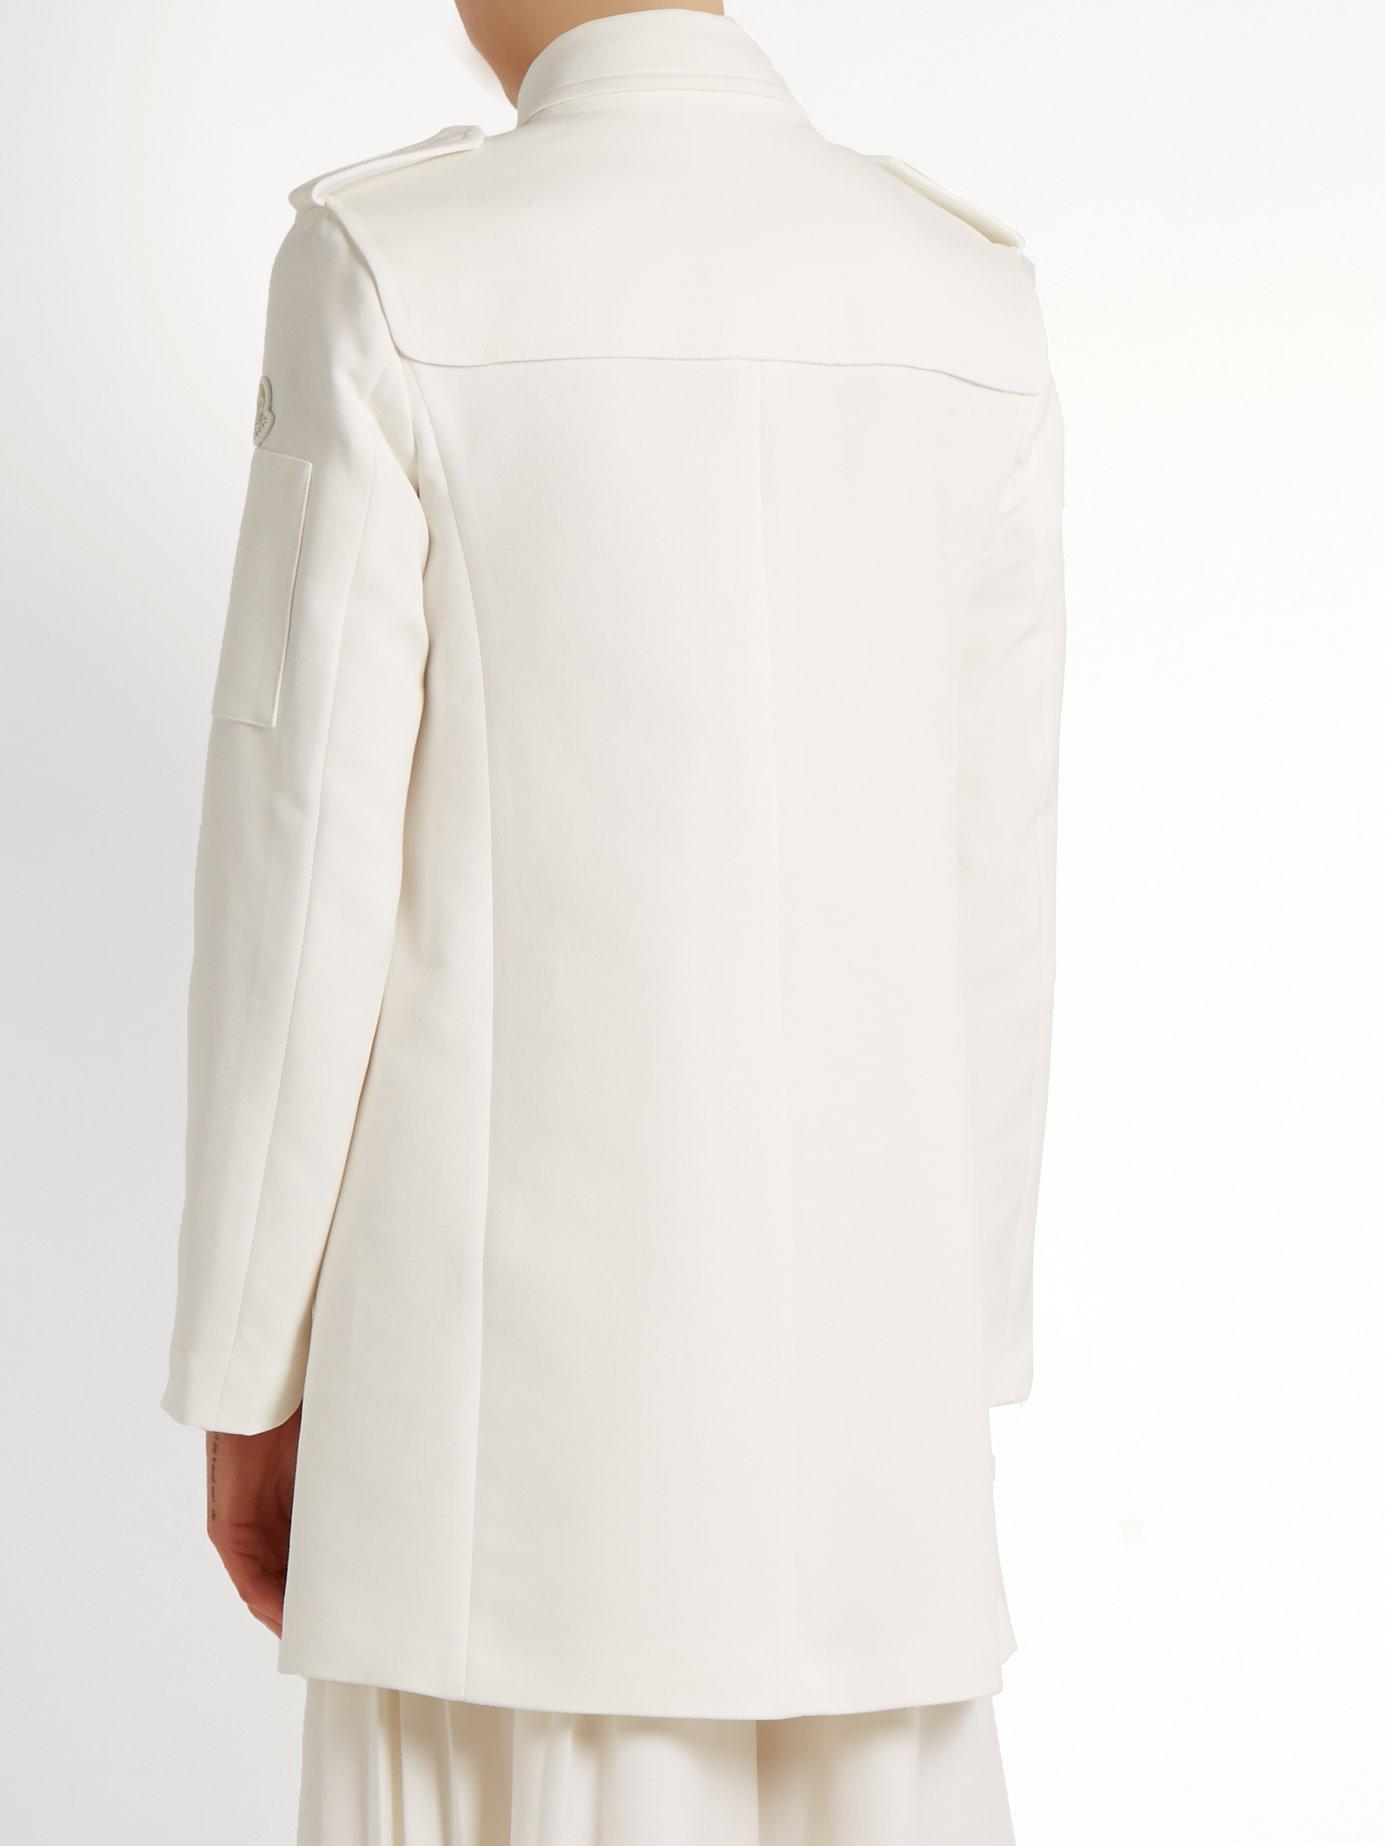 Lera K cotton coat by Moncler Gamme Rouge